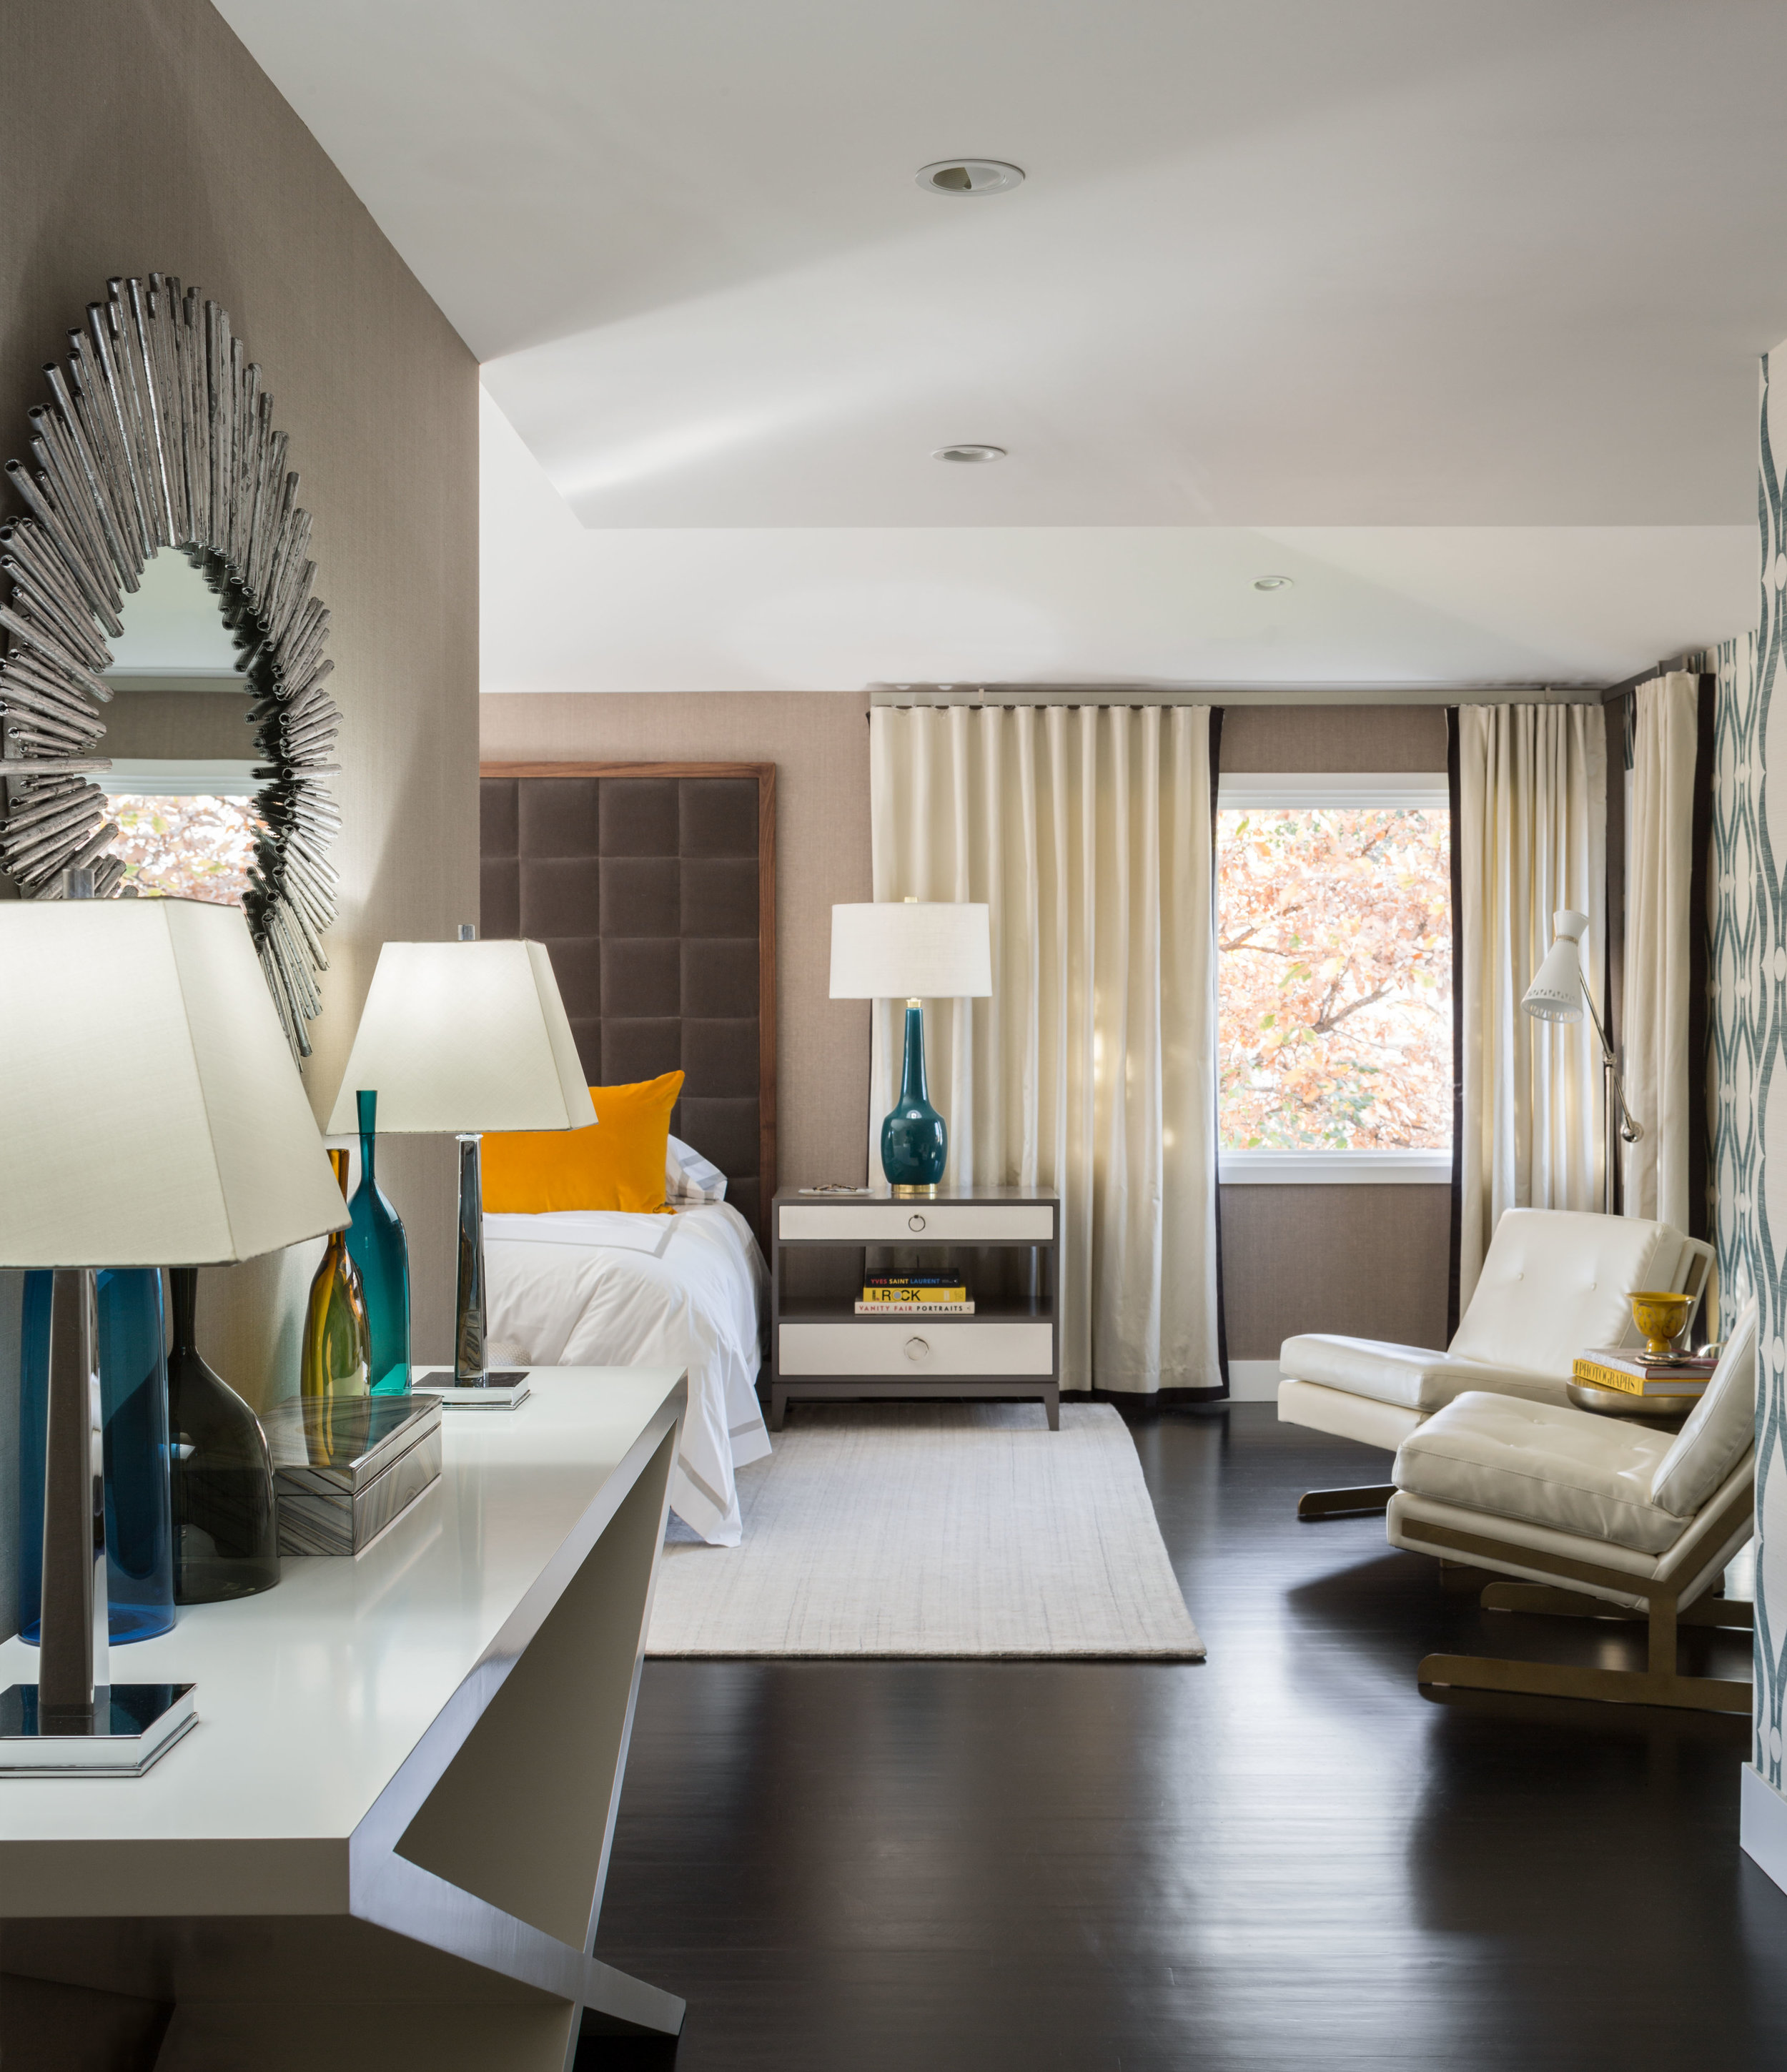 denver-bedroom-design.jpg